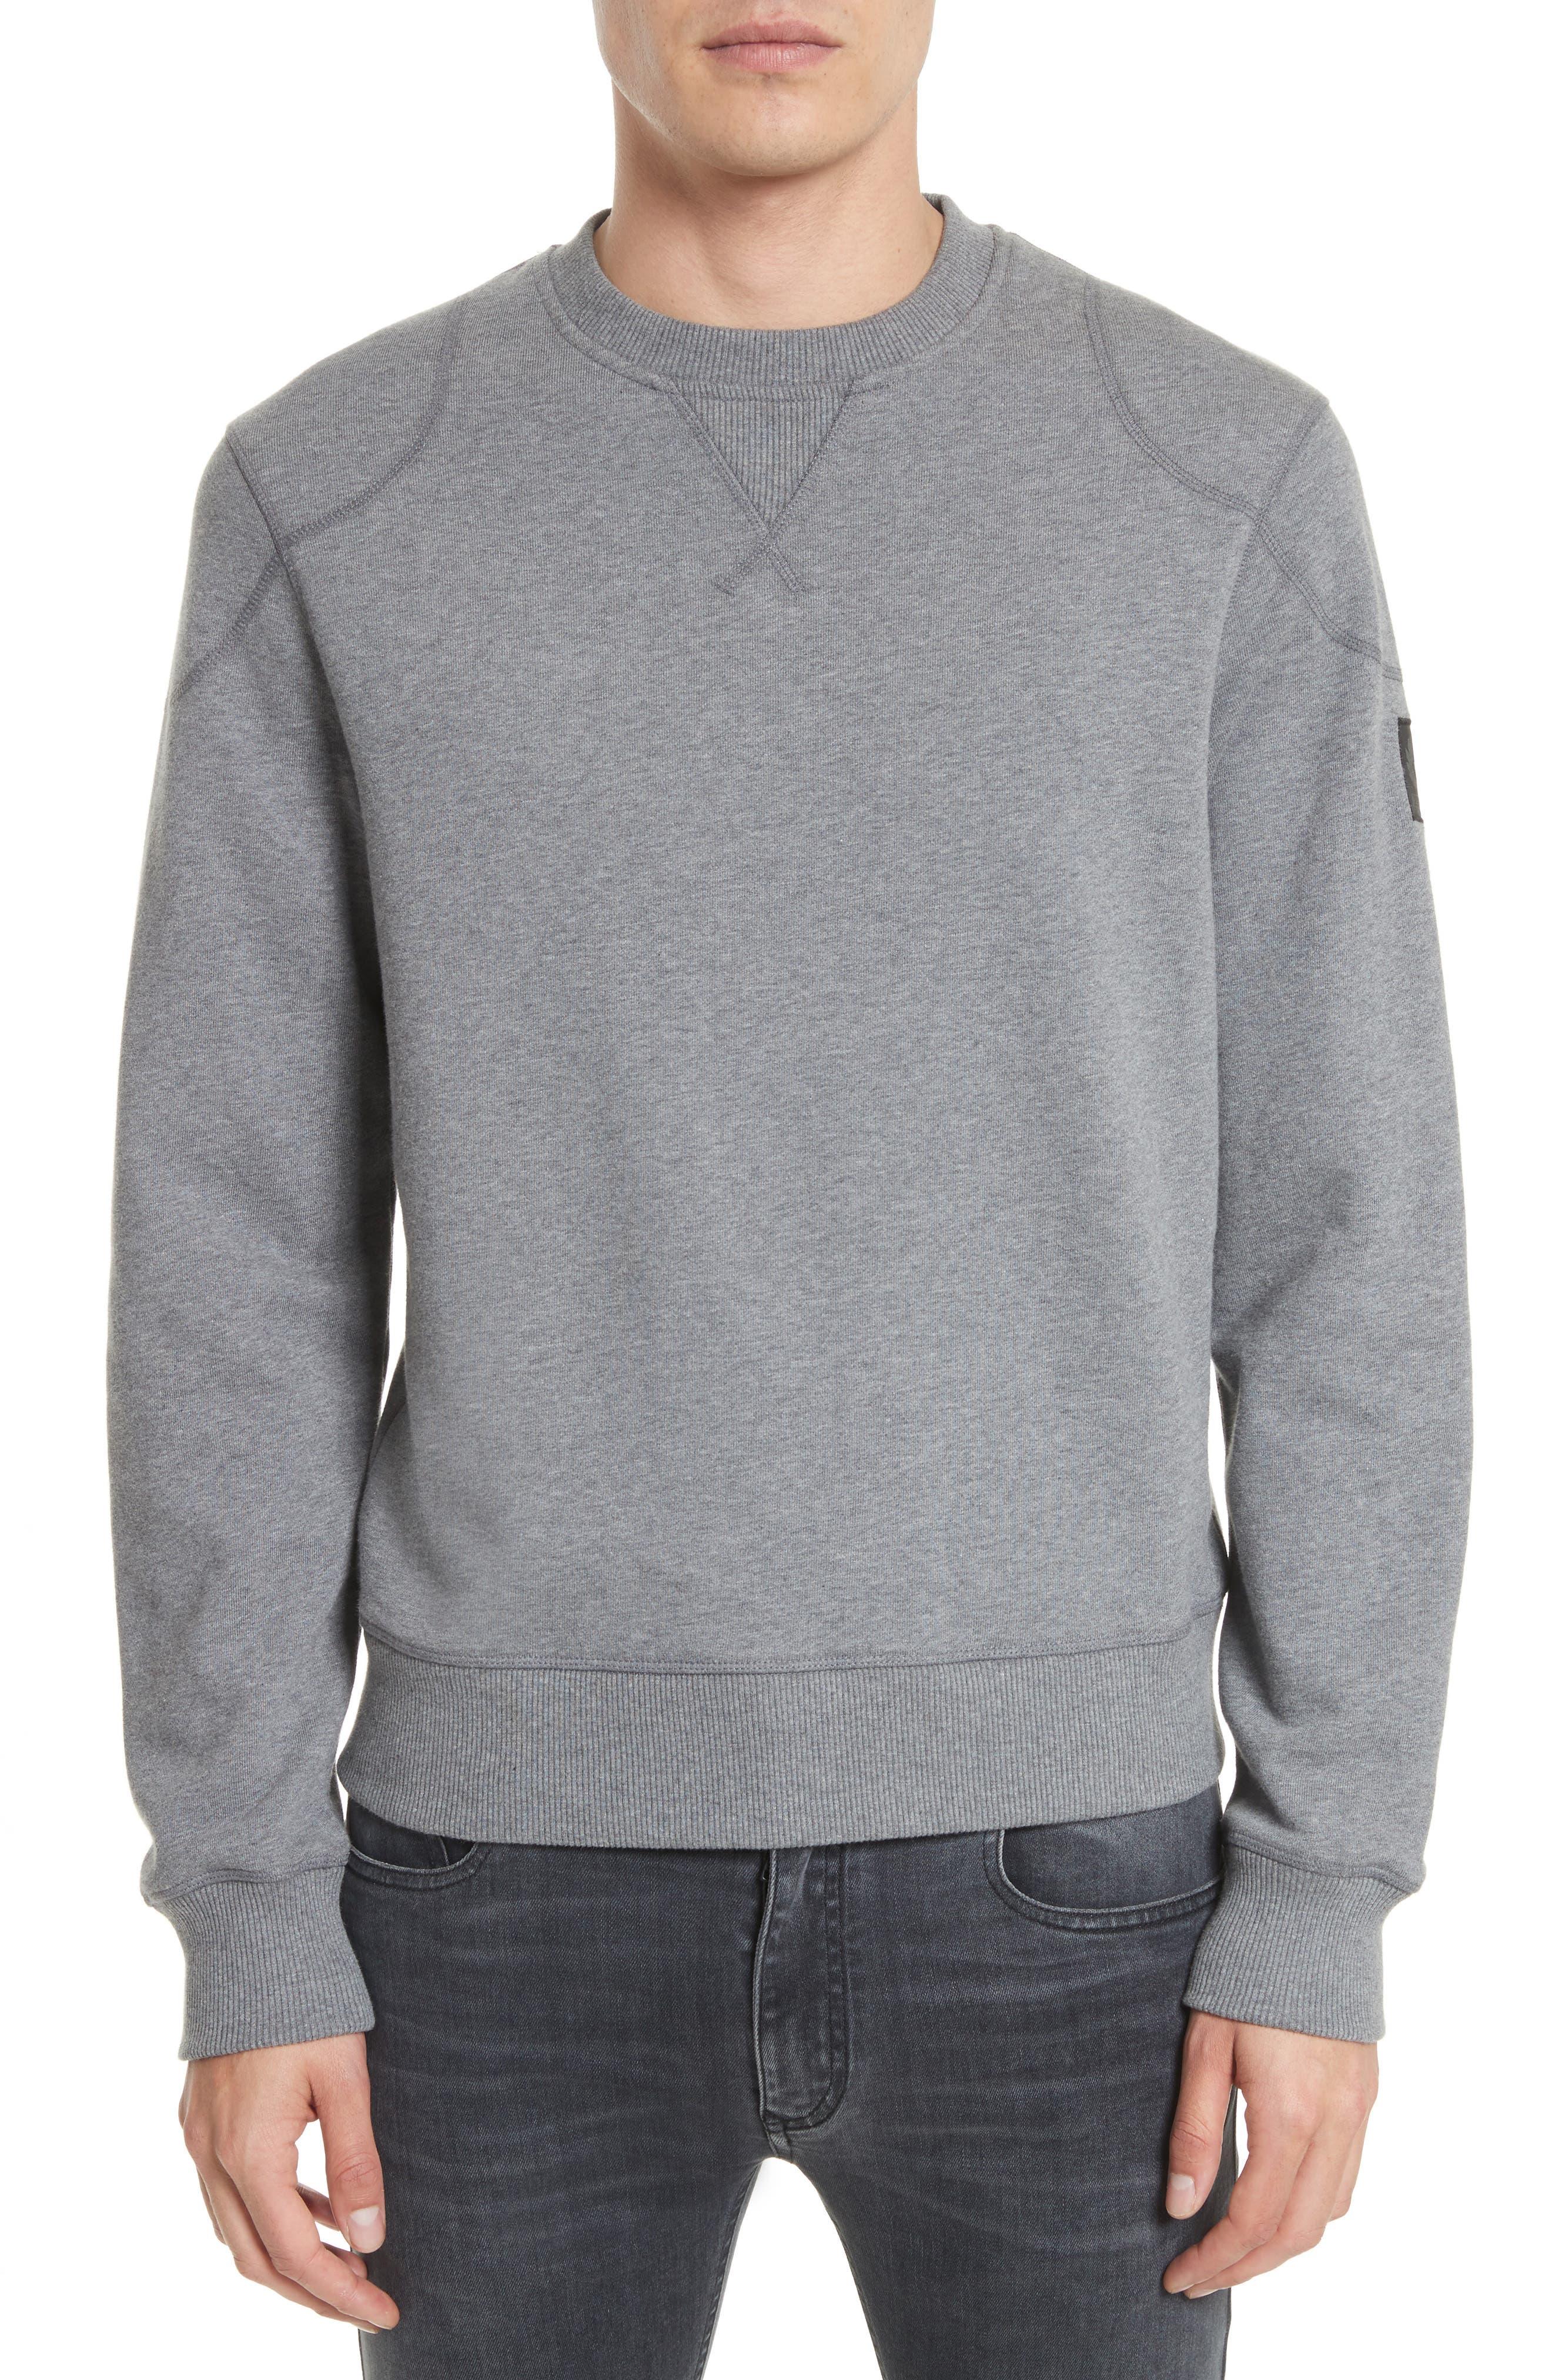 Jefferson Fleece Sweatshirt,                             Main thumbnail 1, color,                             020